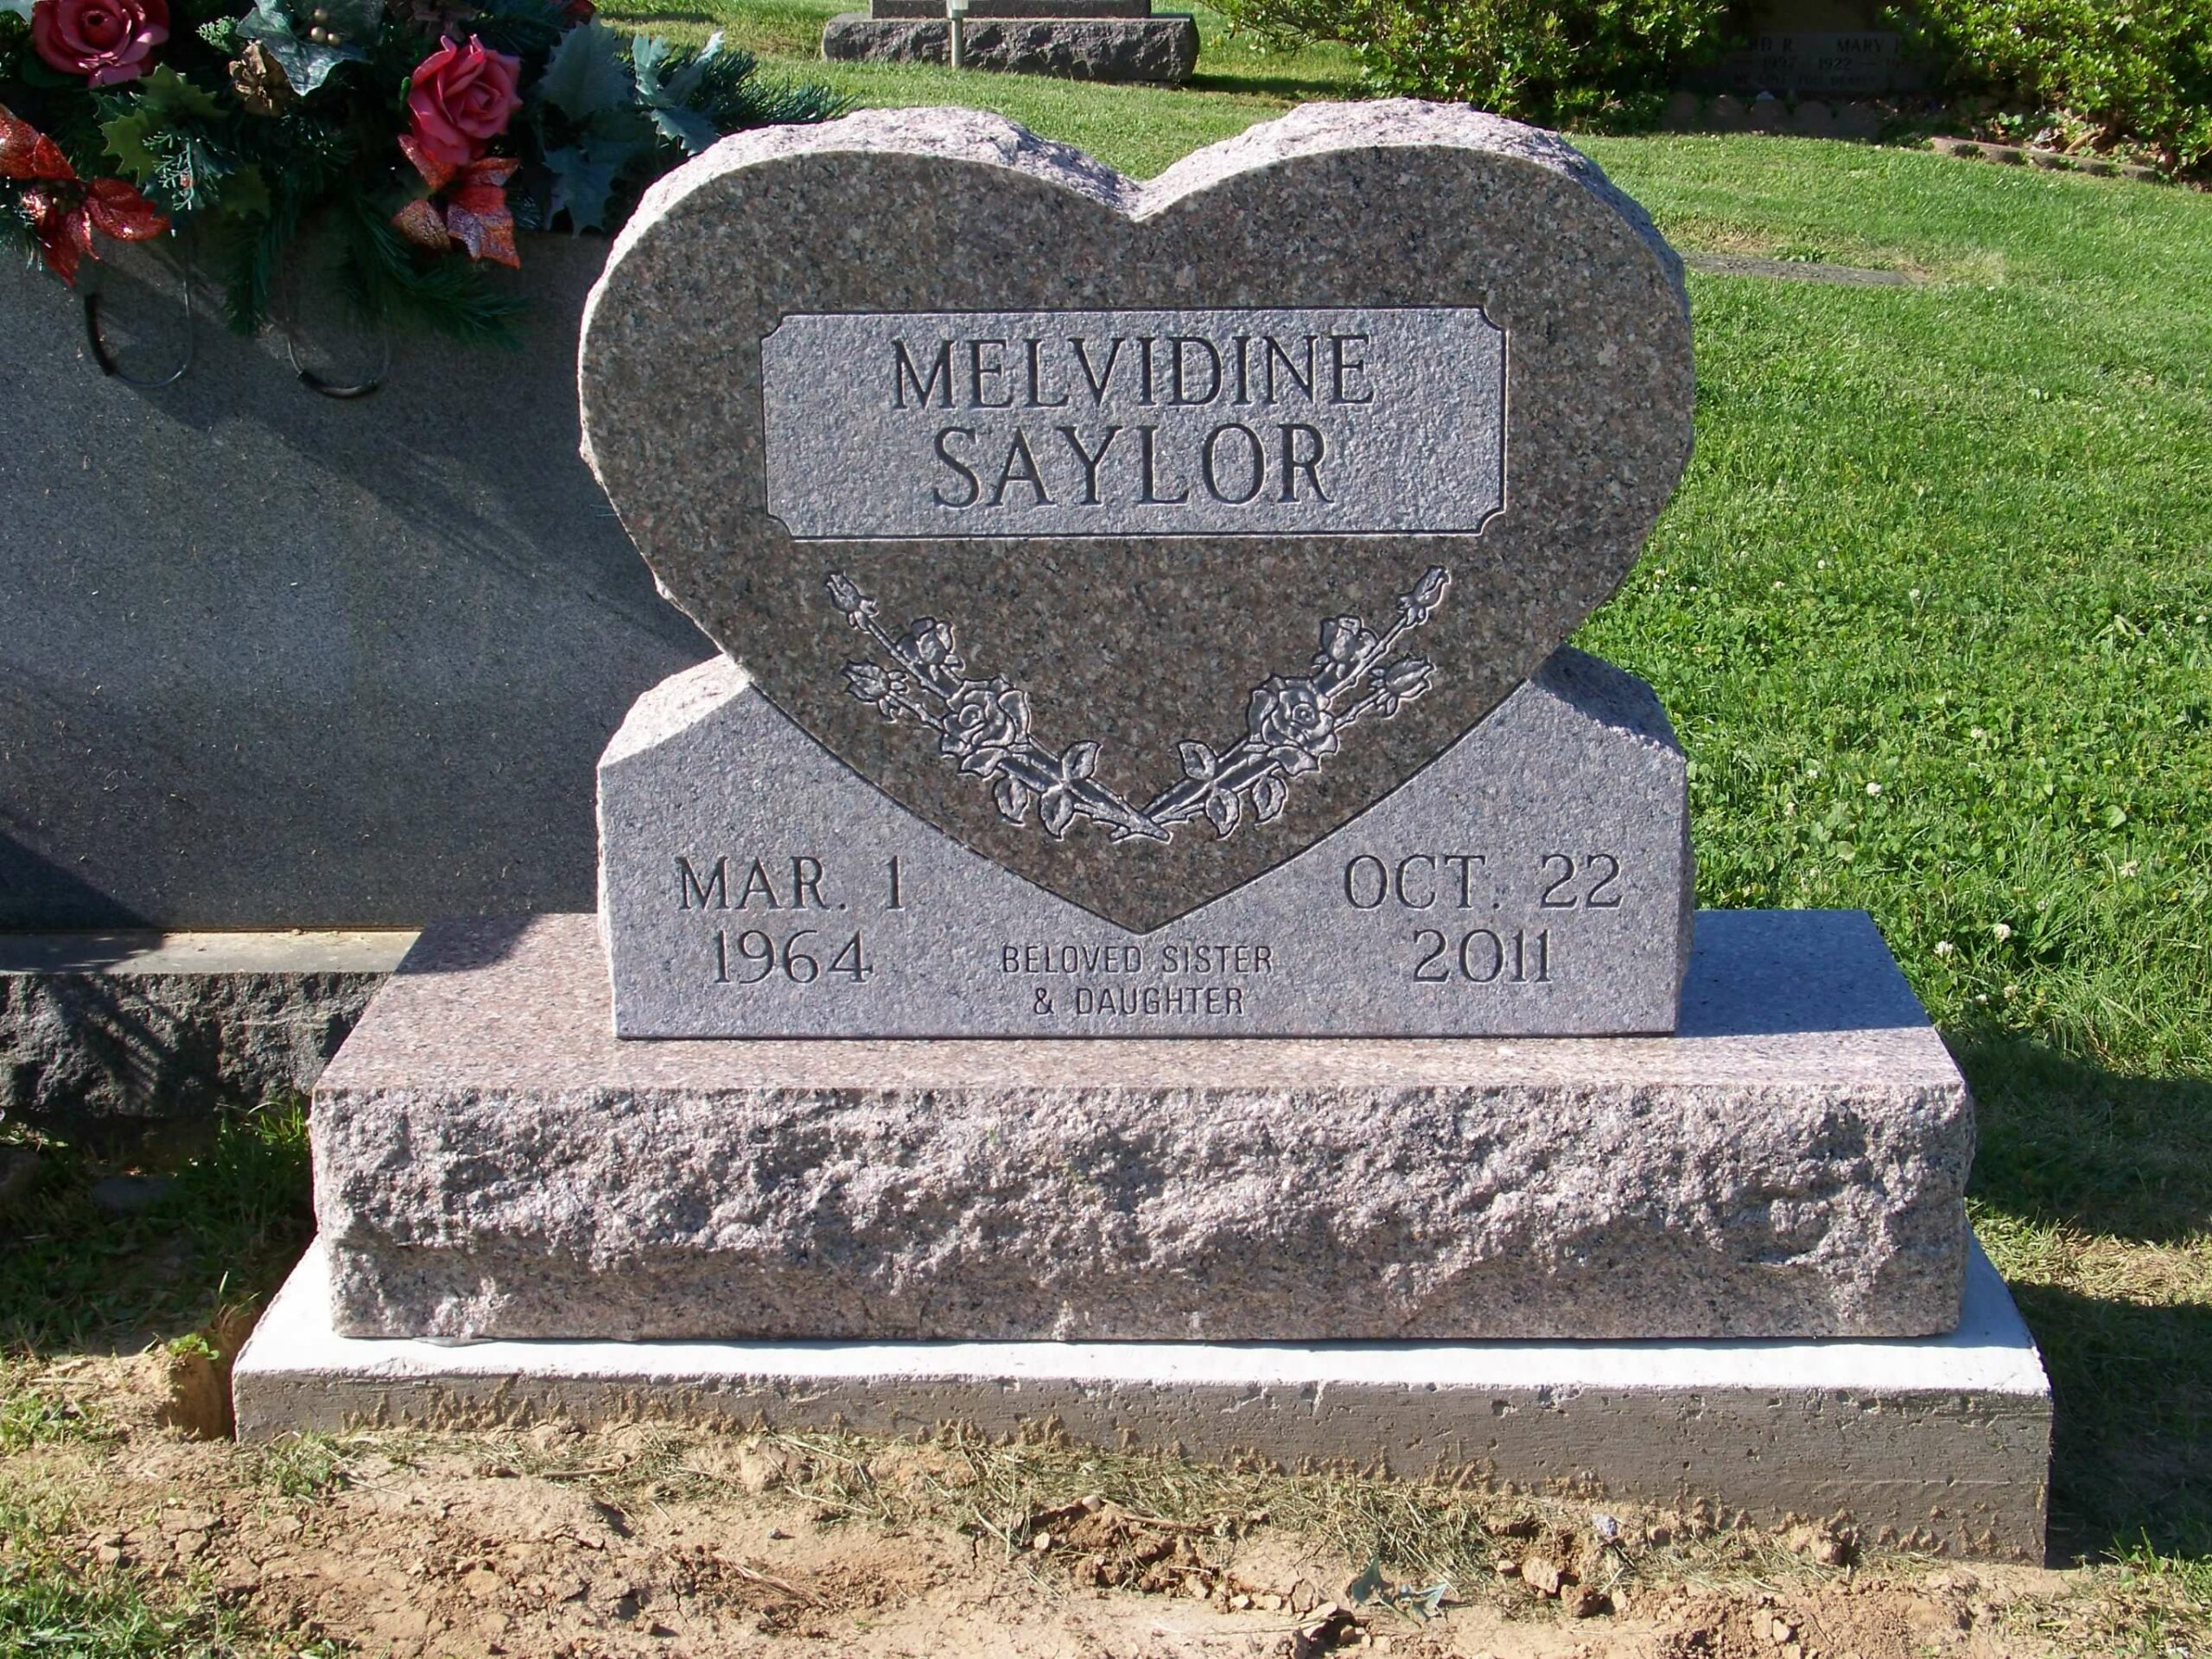 Saylor, Melvidine